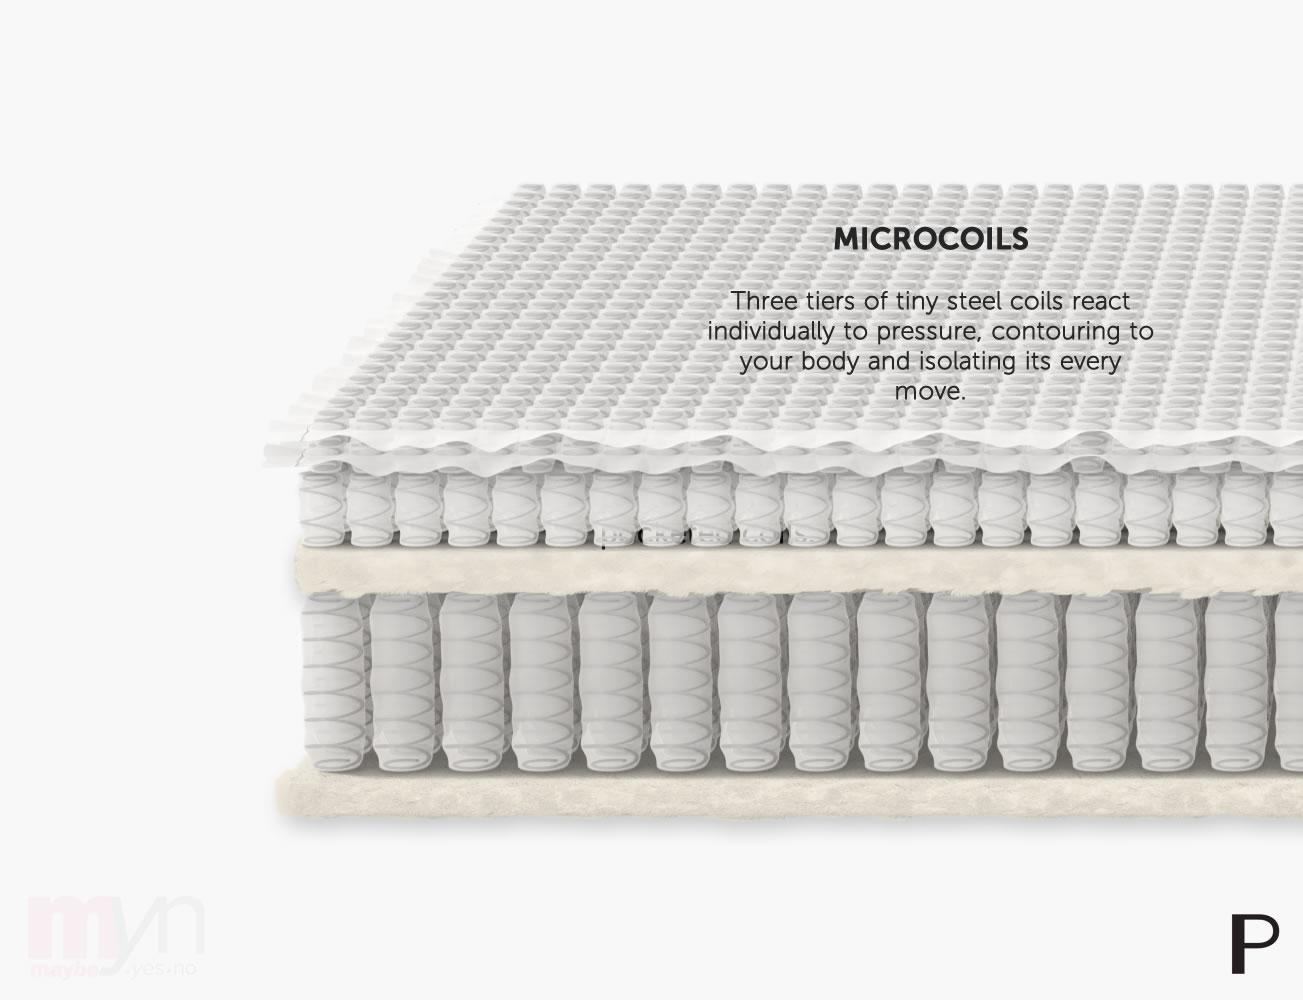 MICROCOILS